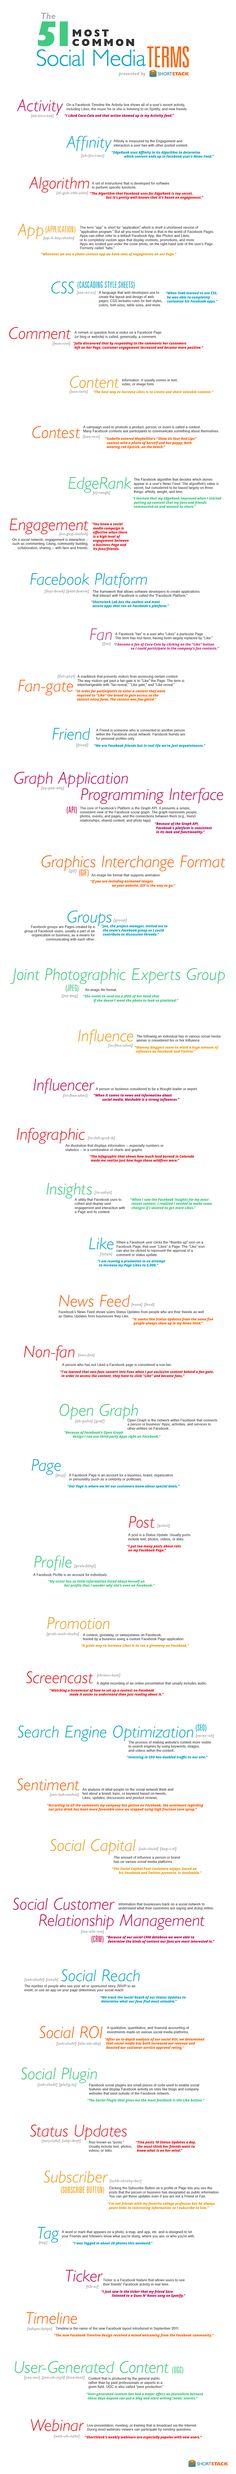 51 Social Media Terms #Infographic www.socialmediamamma.com